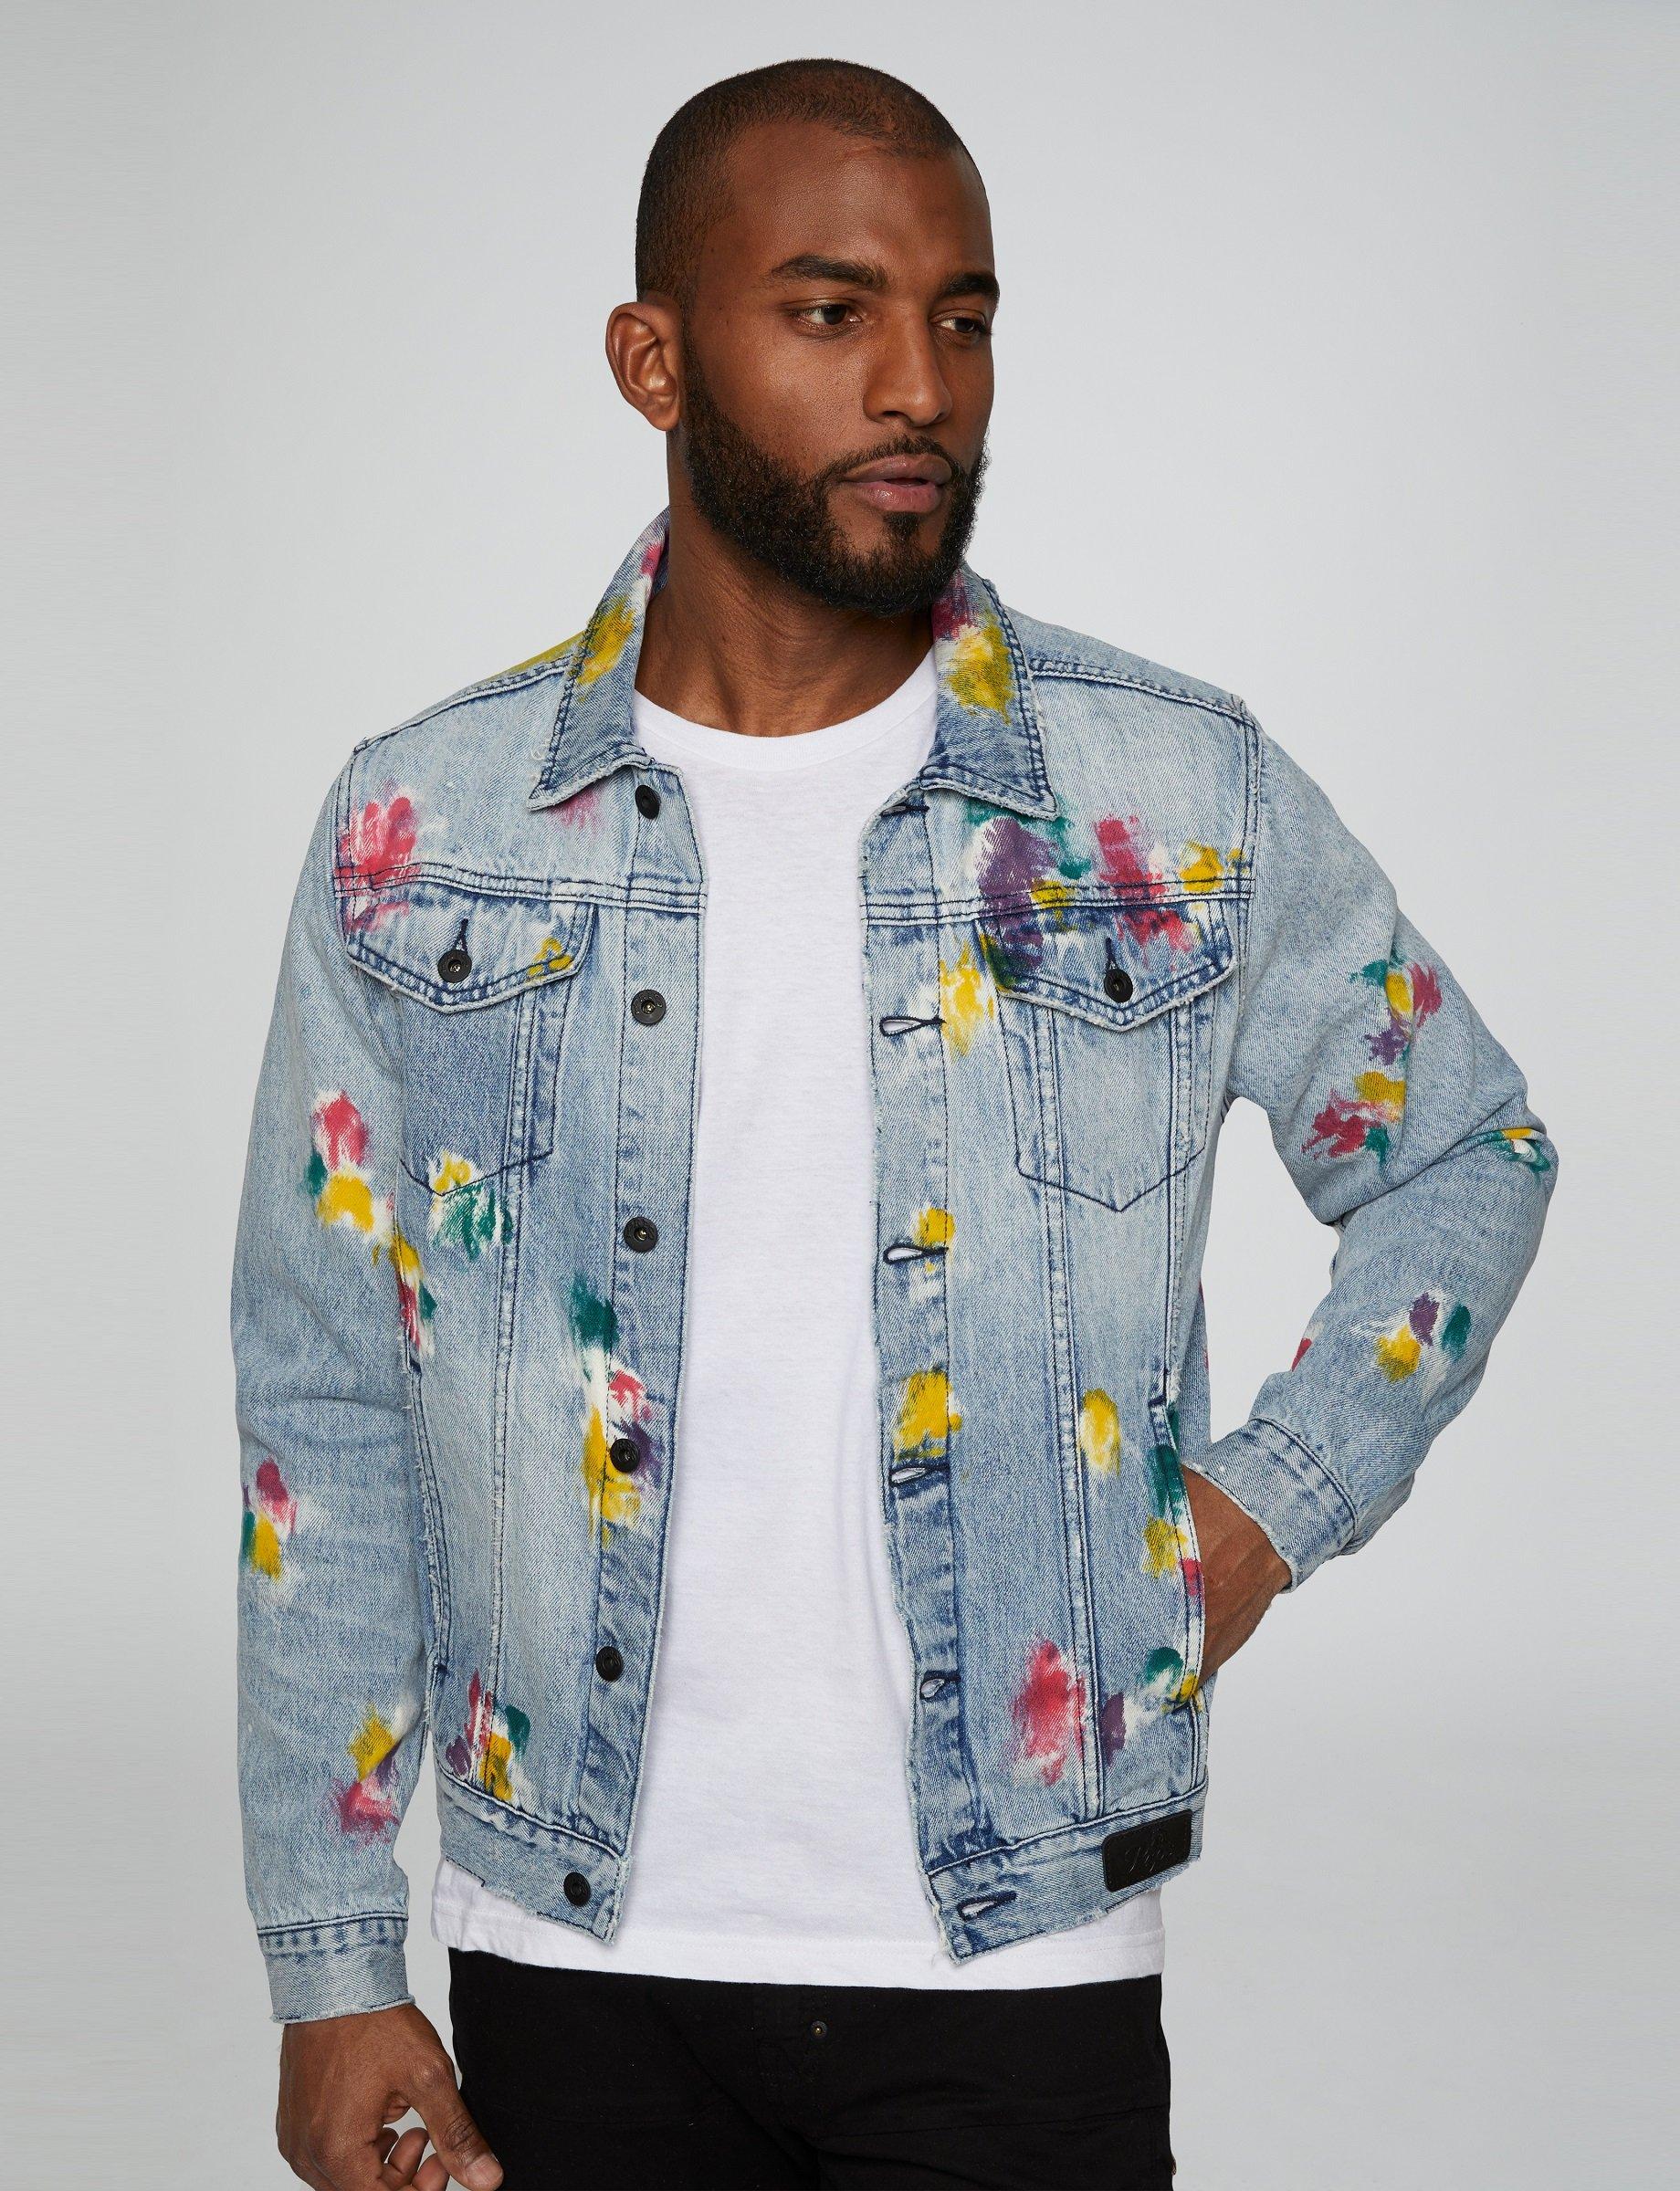 Paint Splatter Denim Jacket Denim Jacket Jackets Mens Denim [ 2400 x 1840 Pixel ]